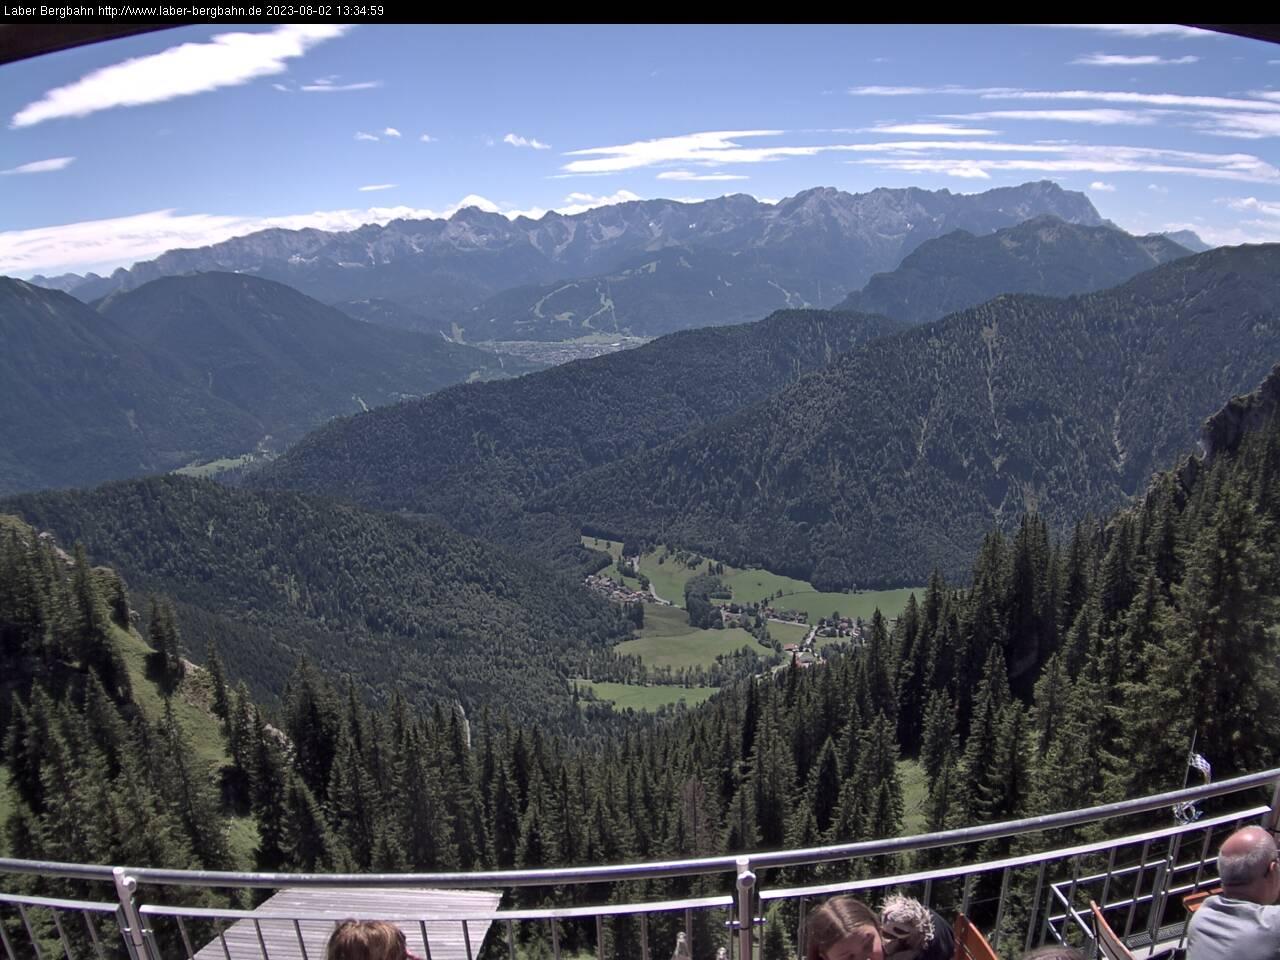 Webcam Skigebiet Oberammergau - Laber Oberbayern